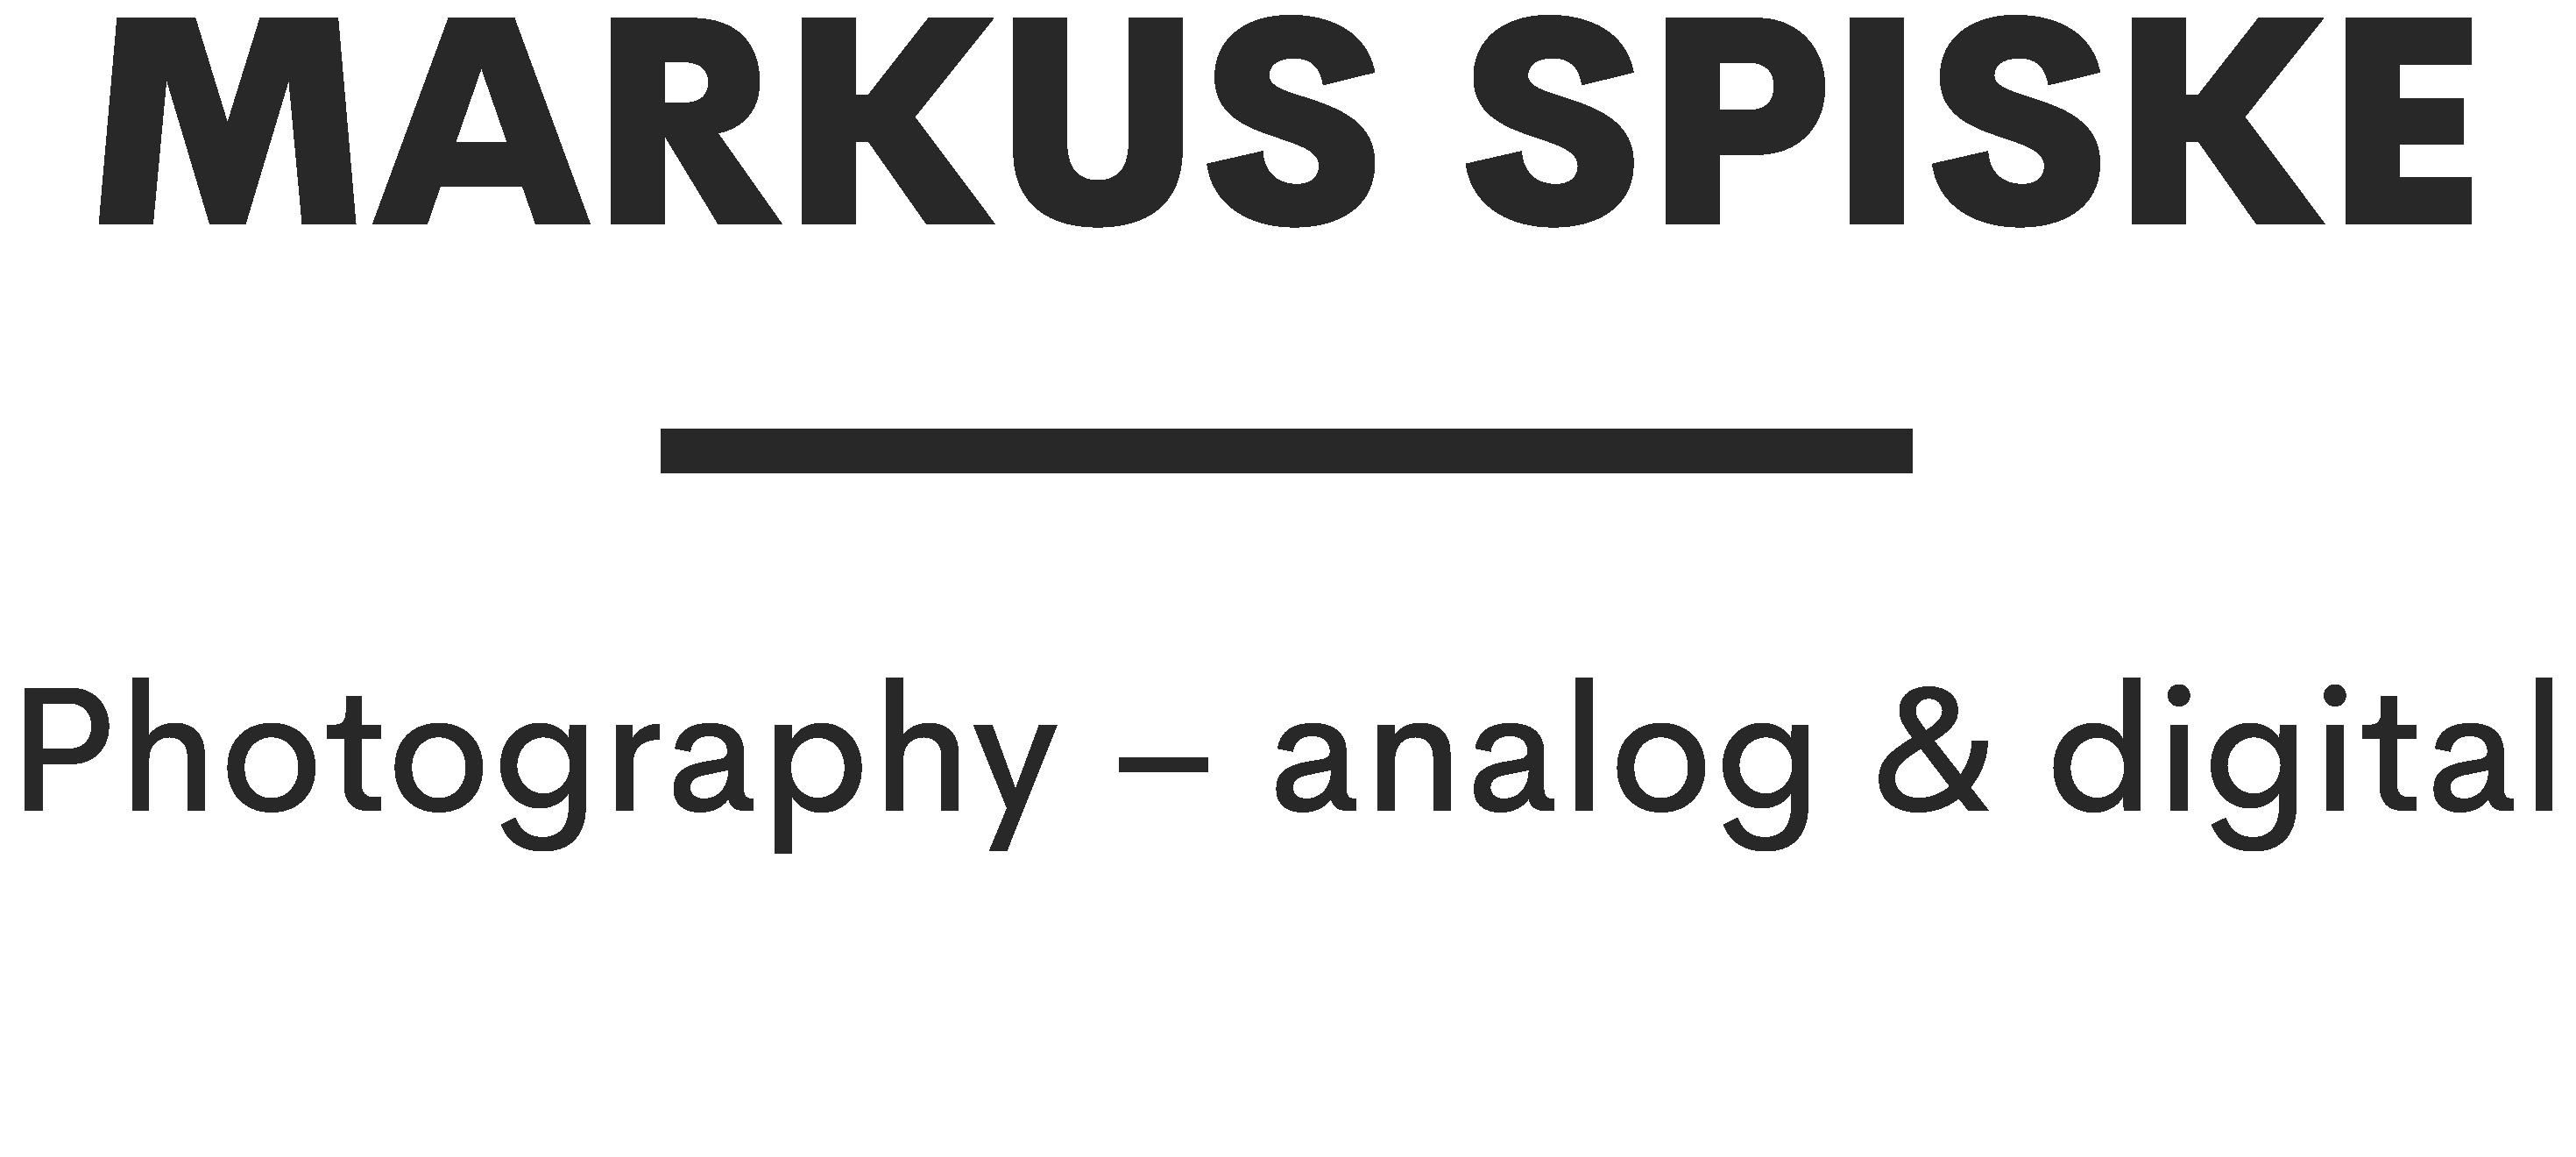 Markus Spiske |Photography